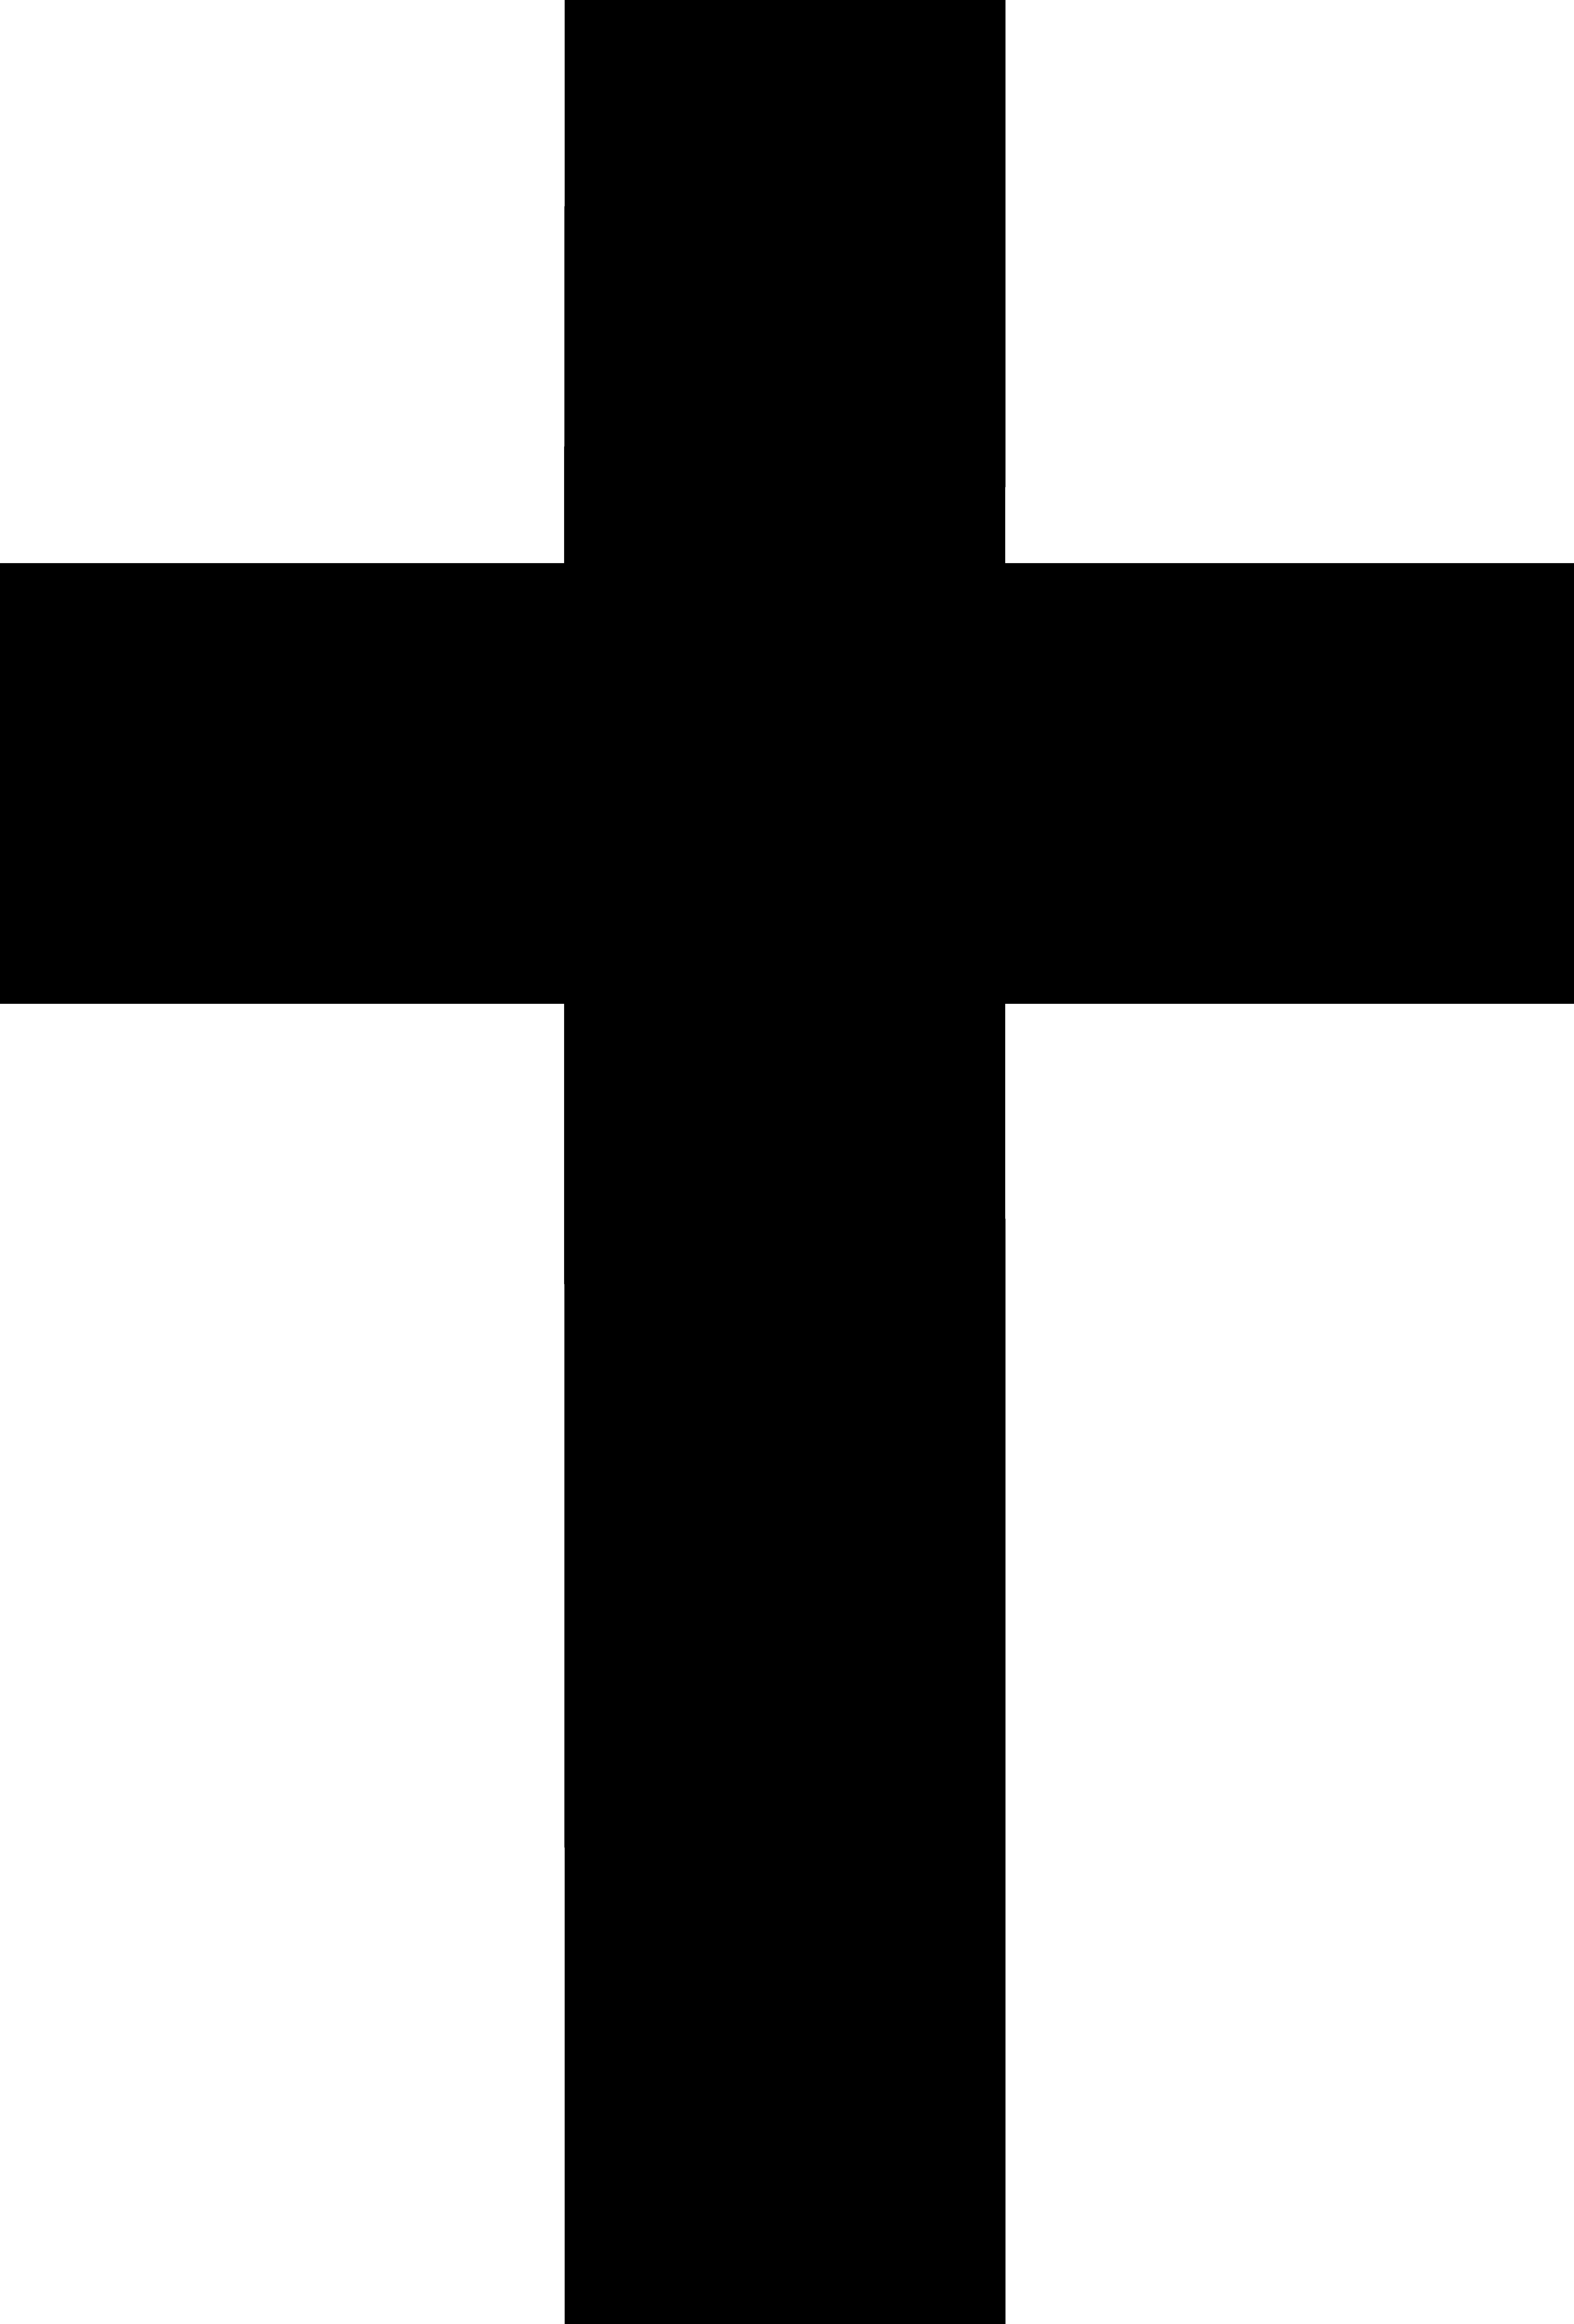 5720x8448 Simple Symbol Cliparts